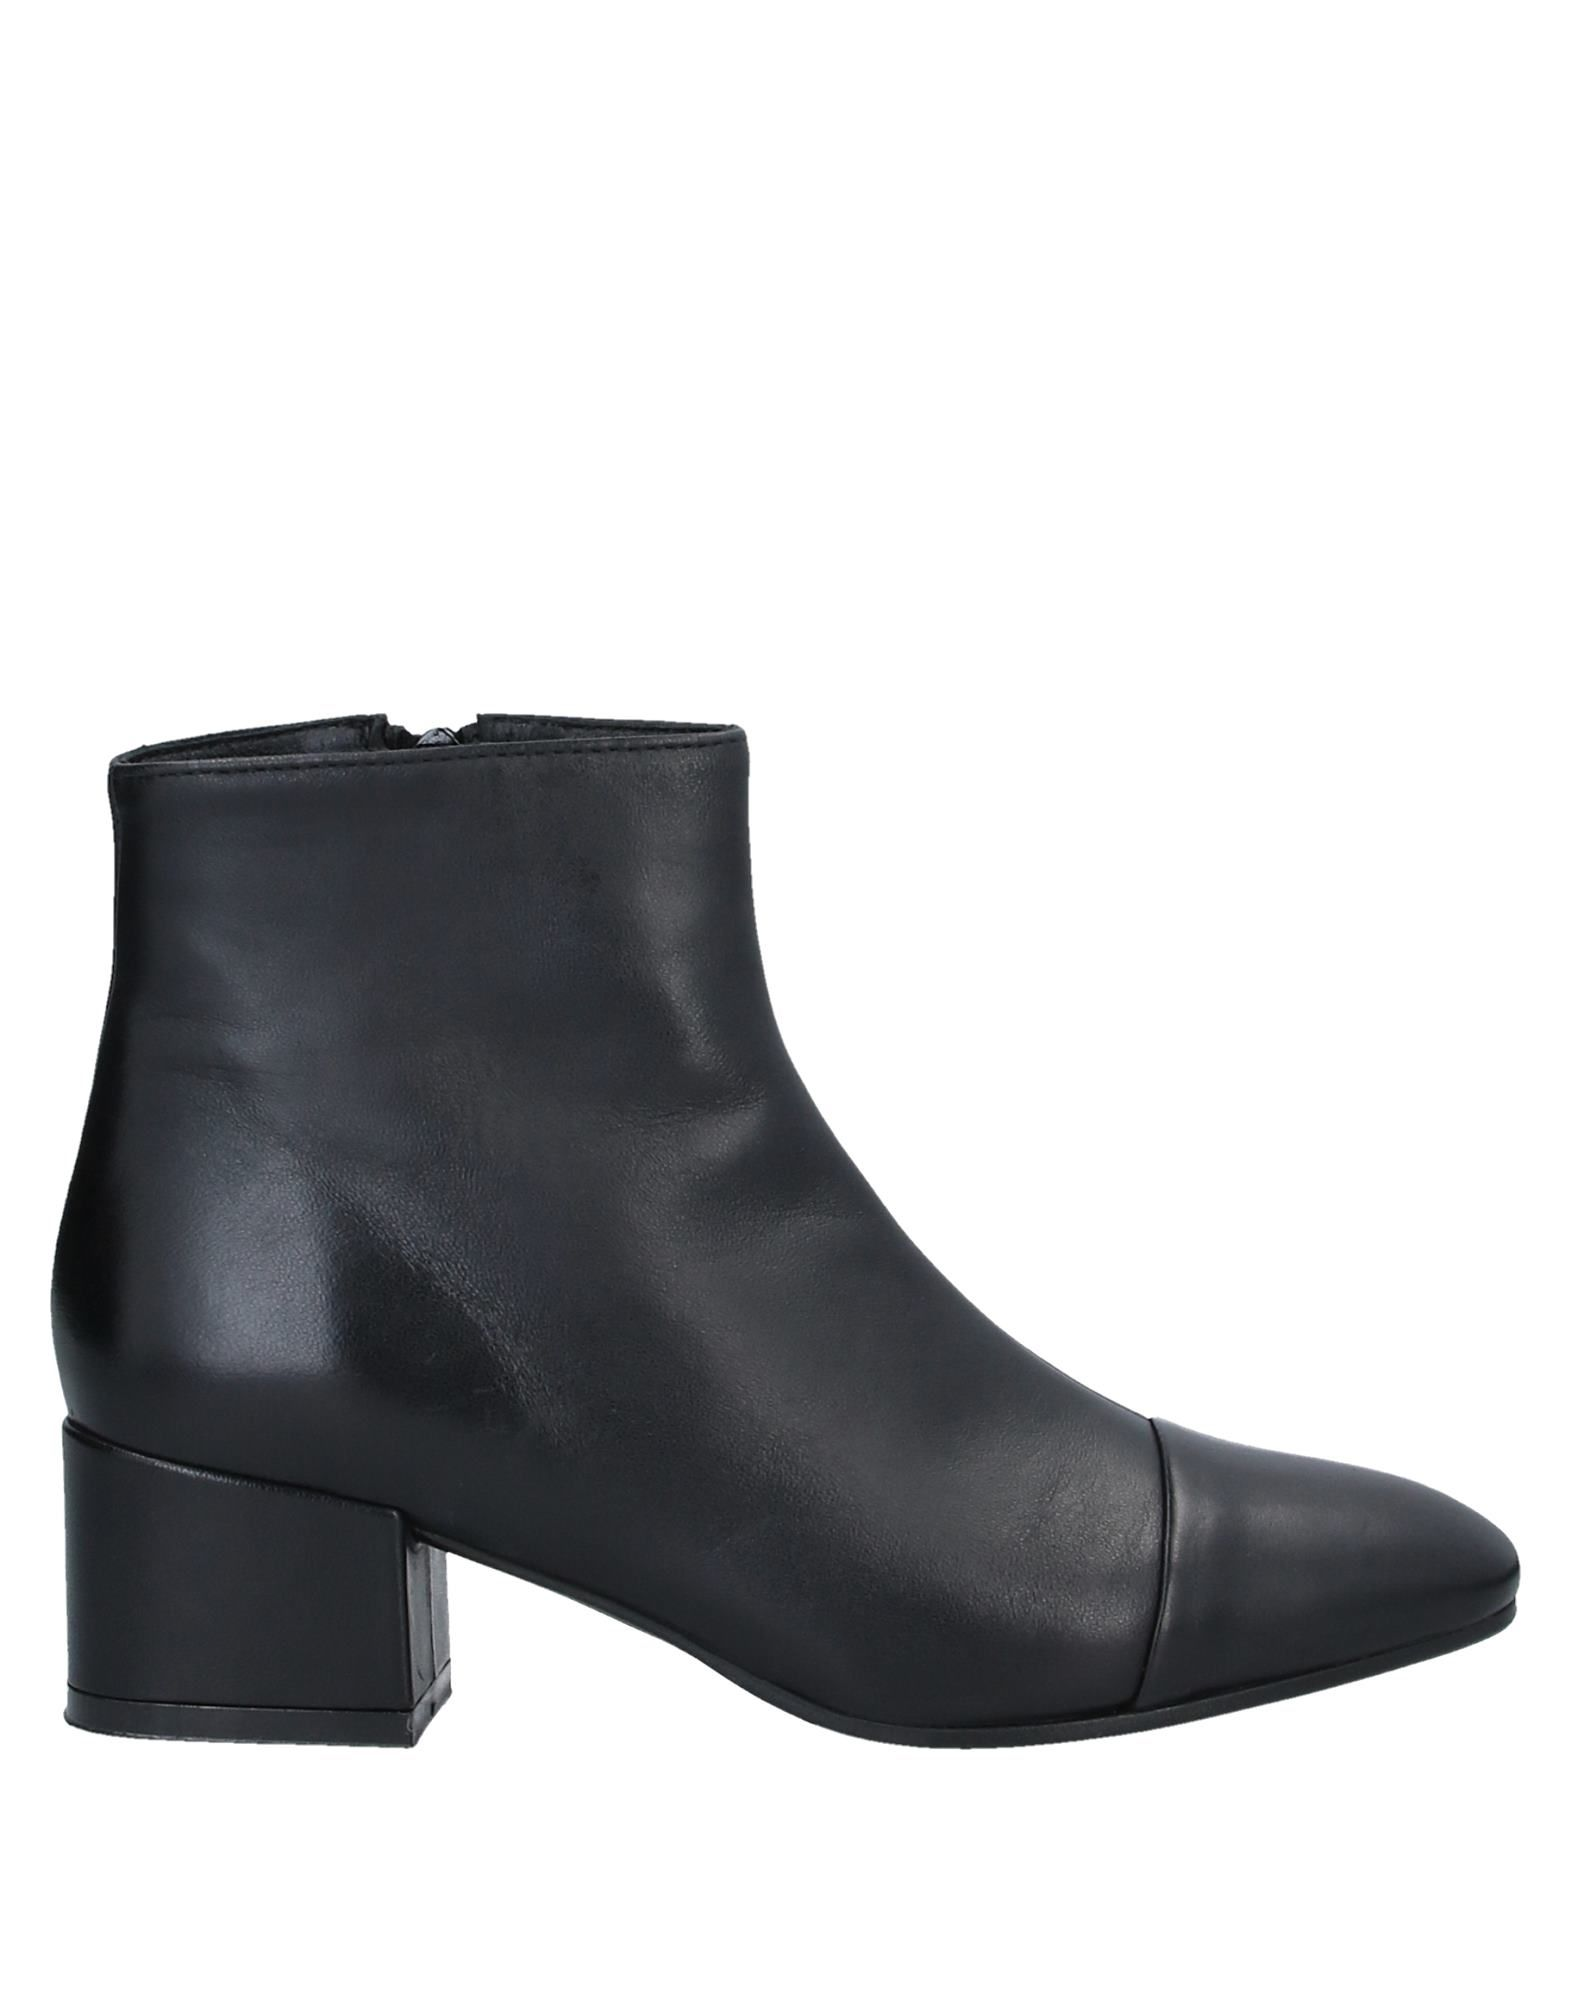 Фото - GIANNI DEL PRETE Полусапоги и высокие ботинки gianni bravo полусапоги и высокие ботинки